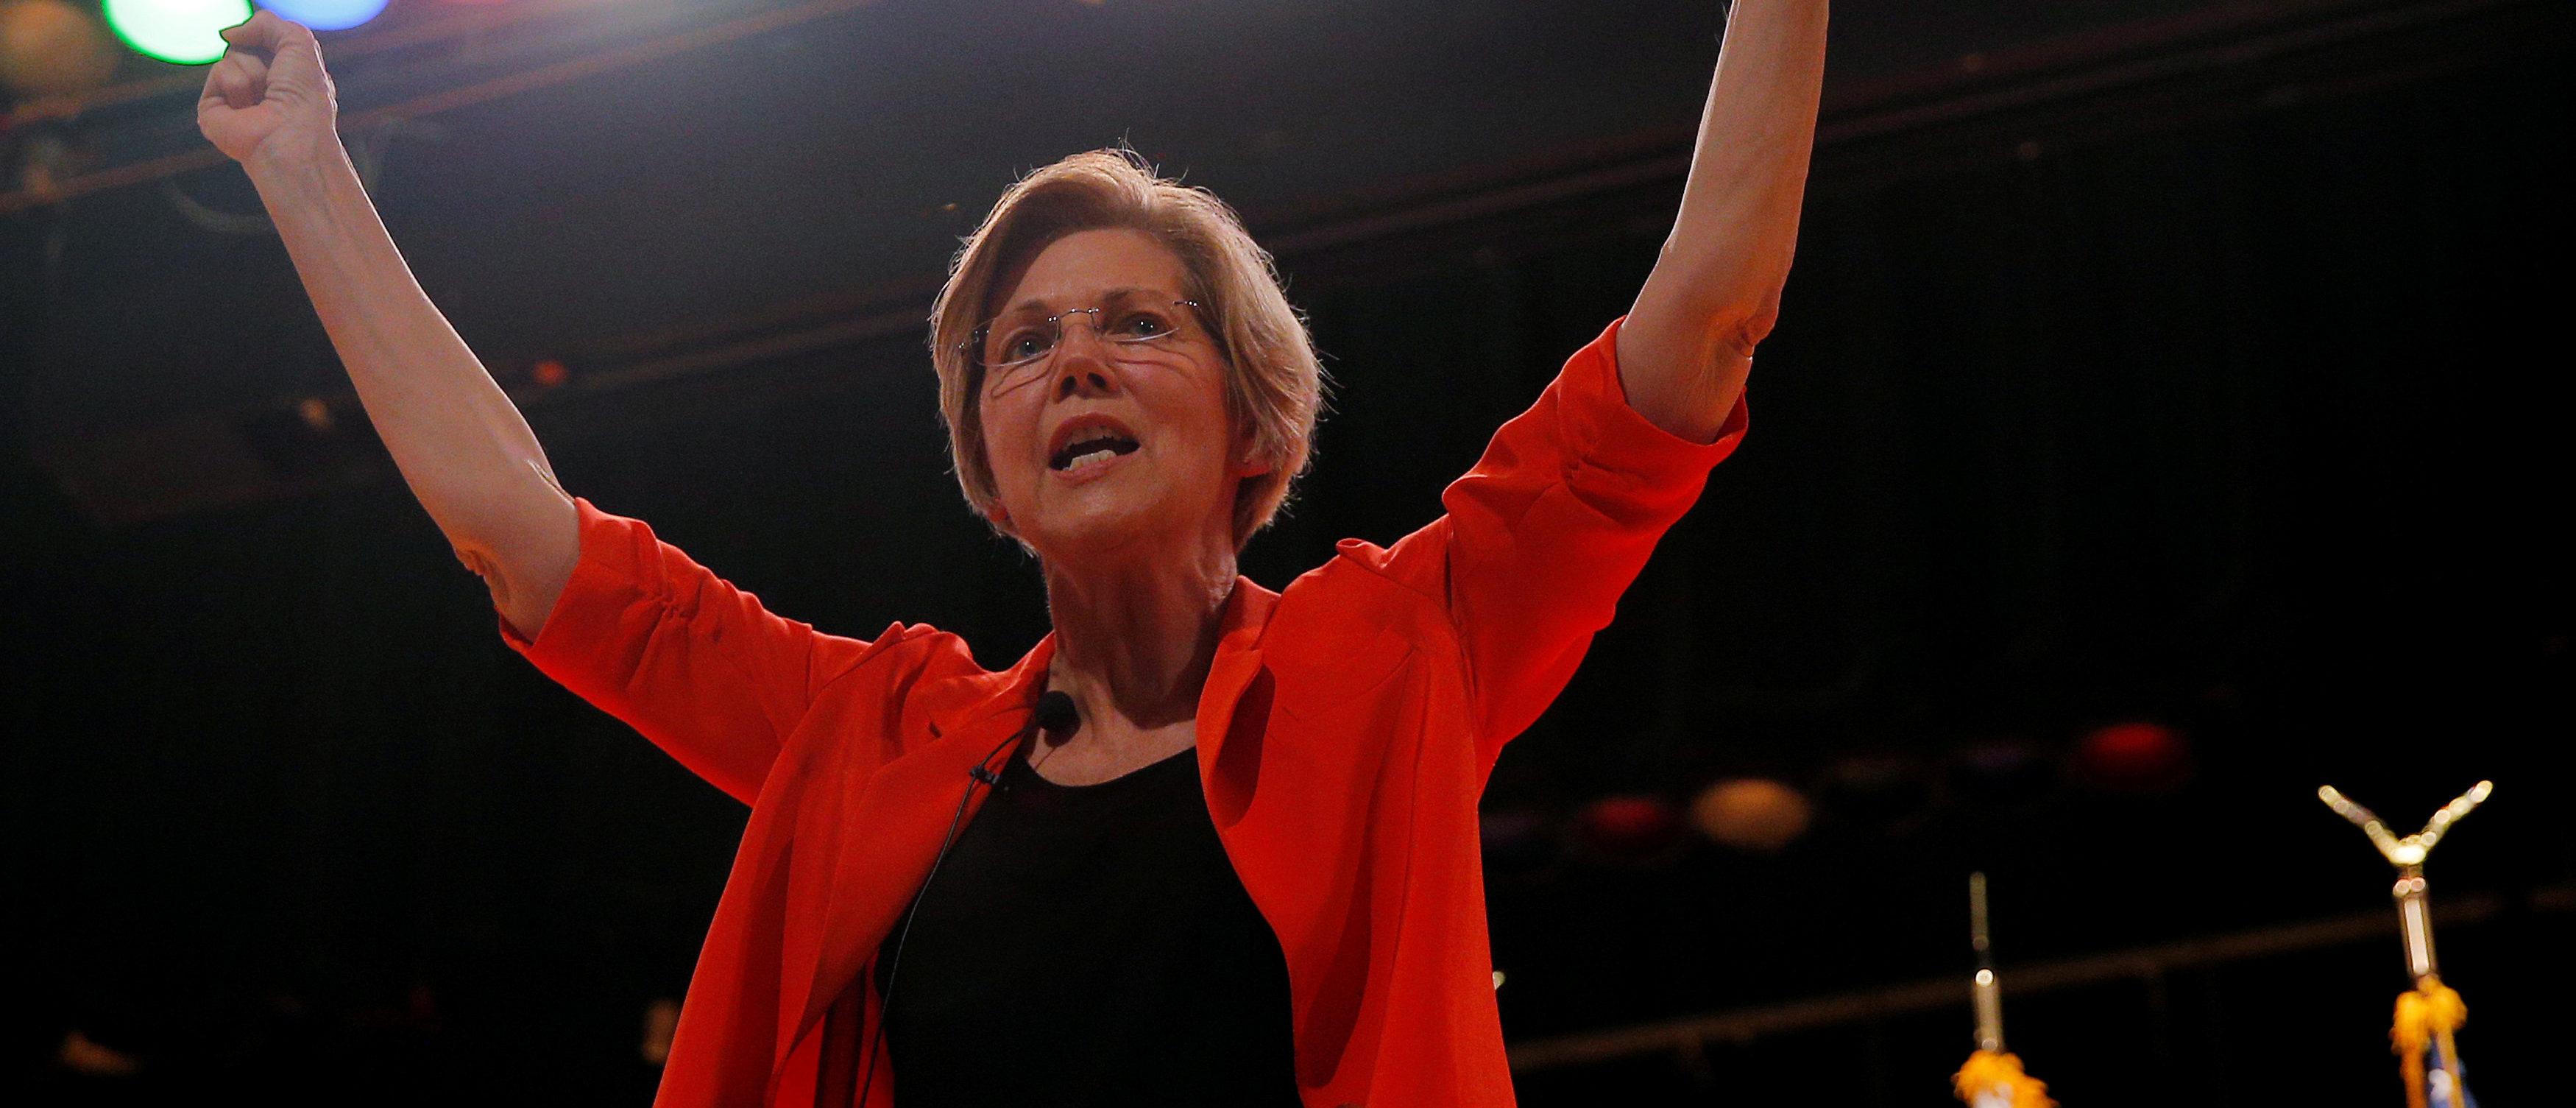 U.S. Senator Elizabeth Warren (D-MA) holds a town hall meeting in Revere, Massachusetts, August 4, 2017. REUTERS/Brian Snyder